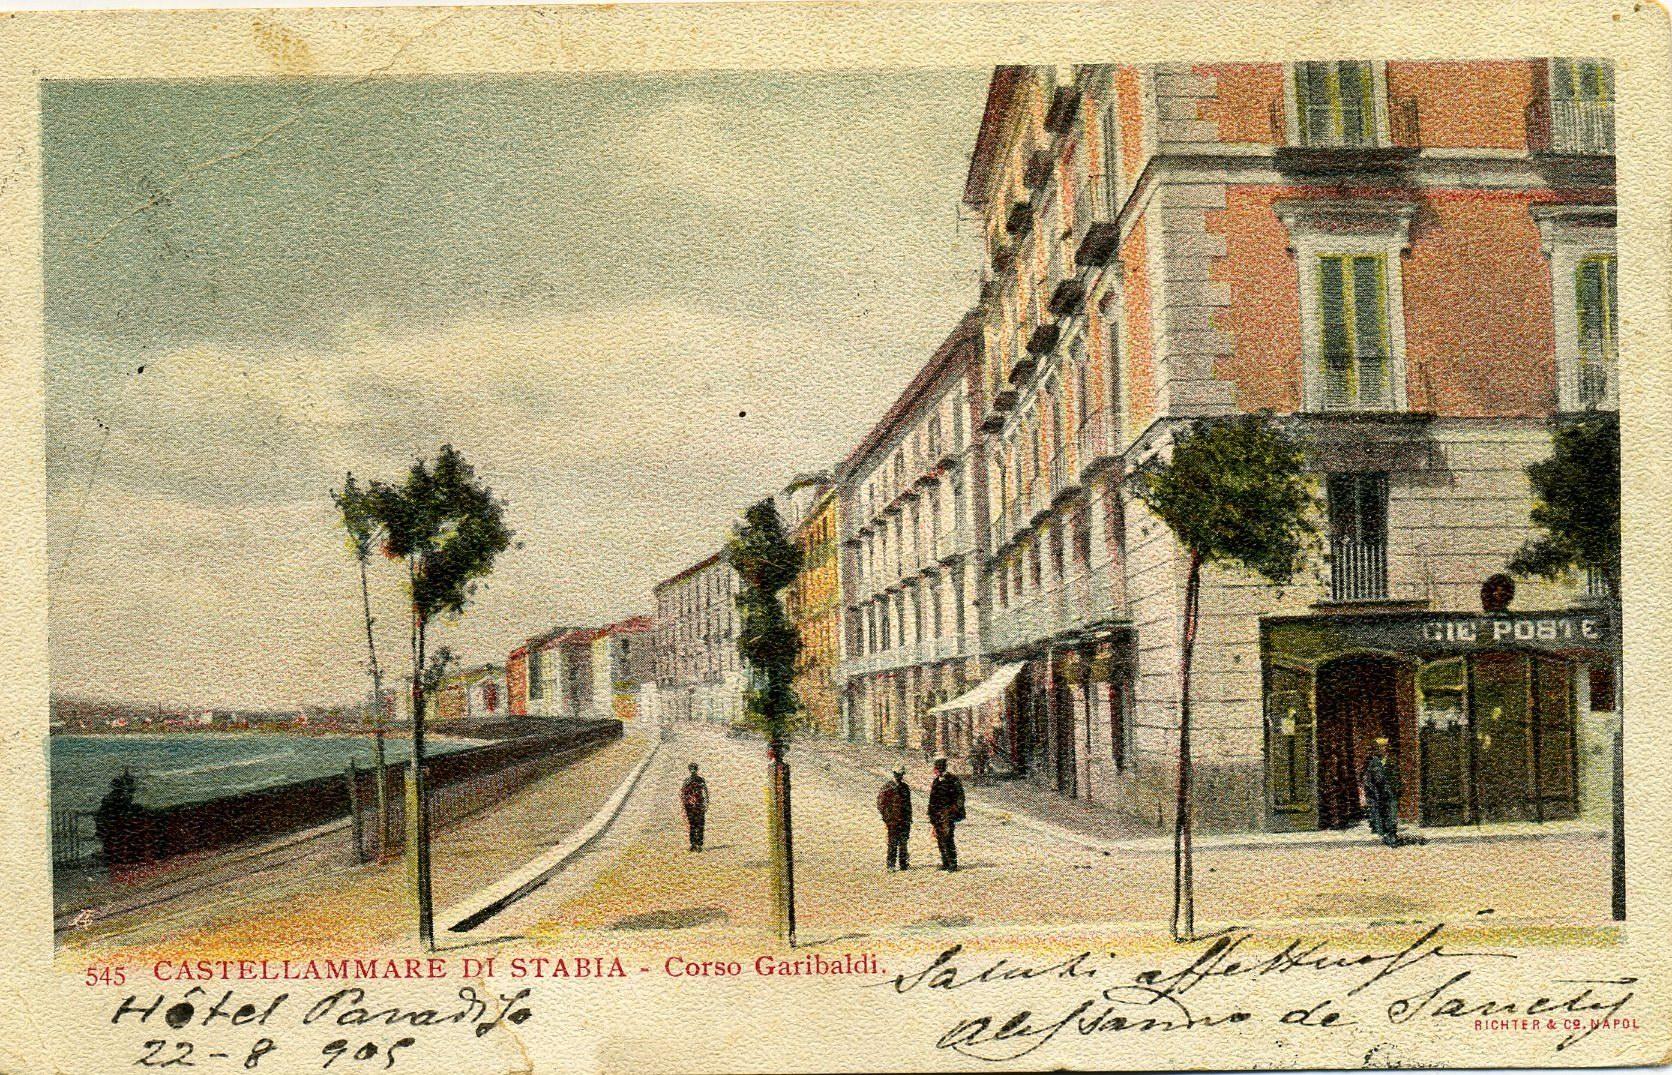 Rege Poste sotto al palazzo Cardone